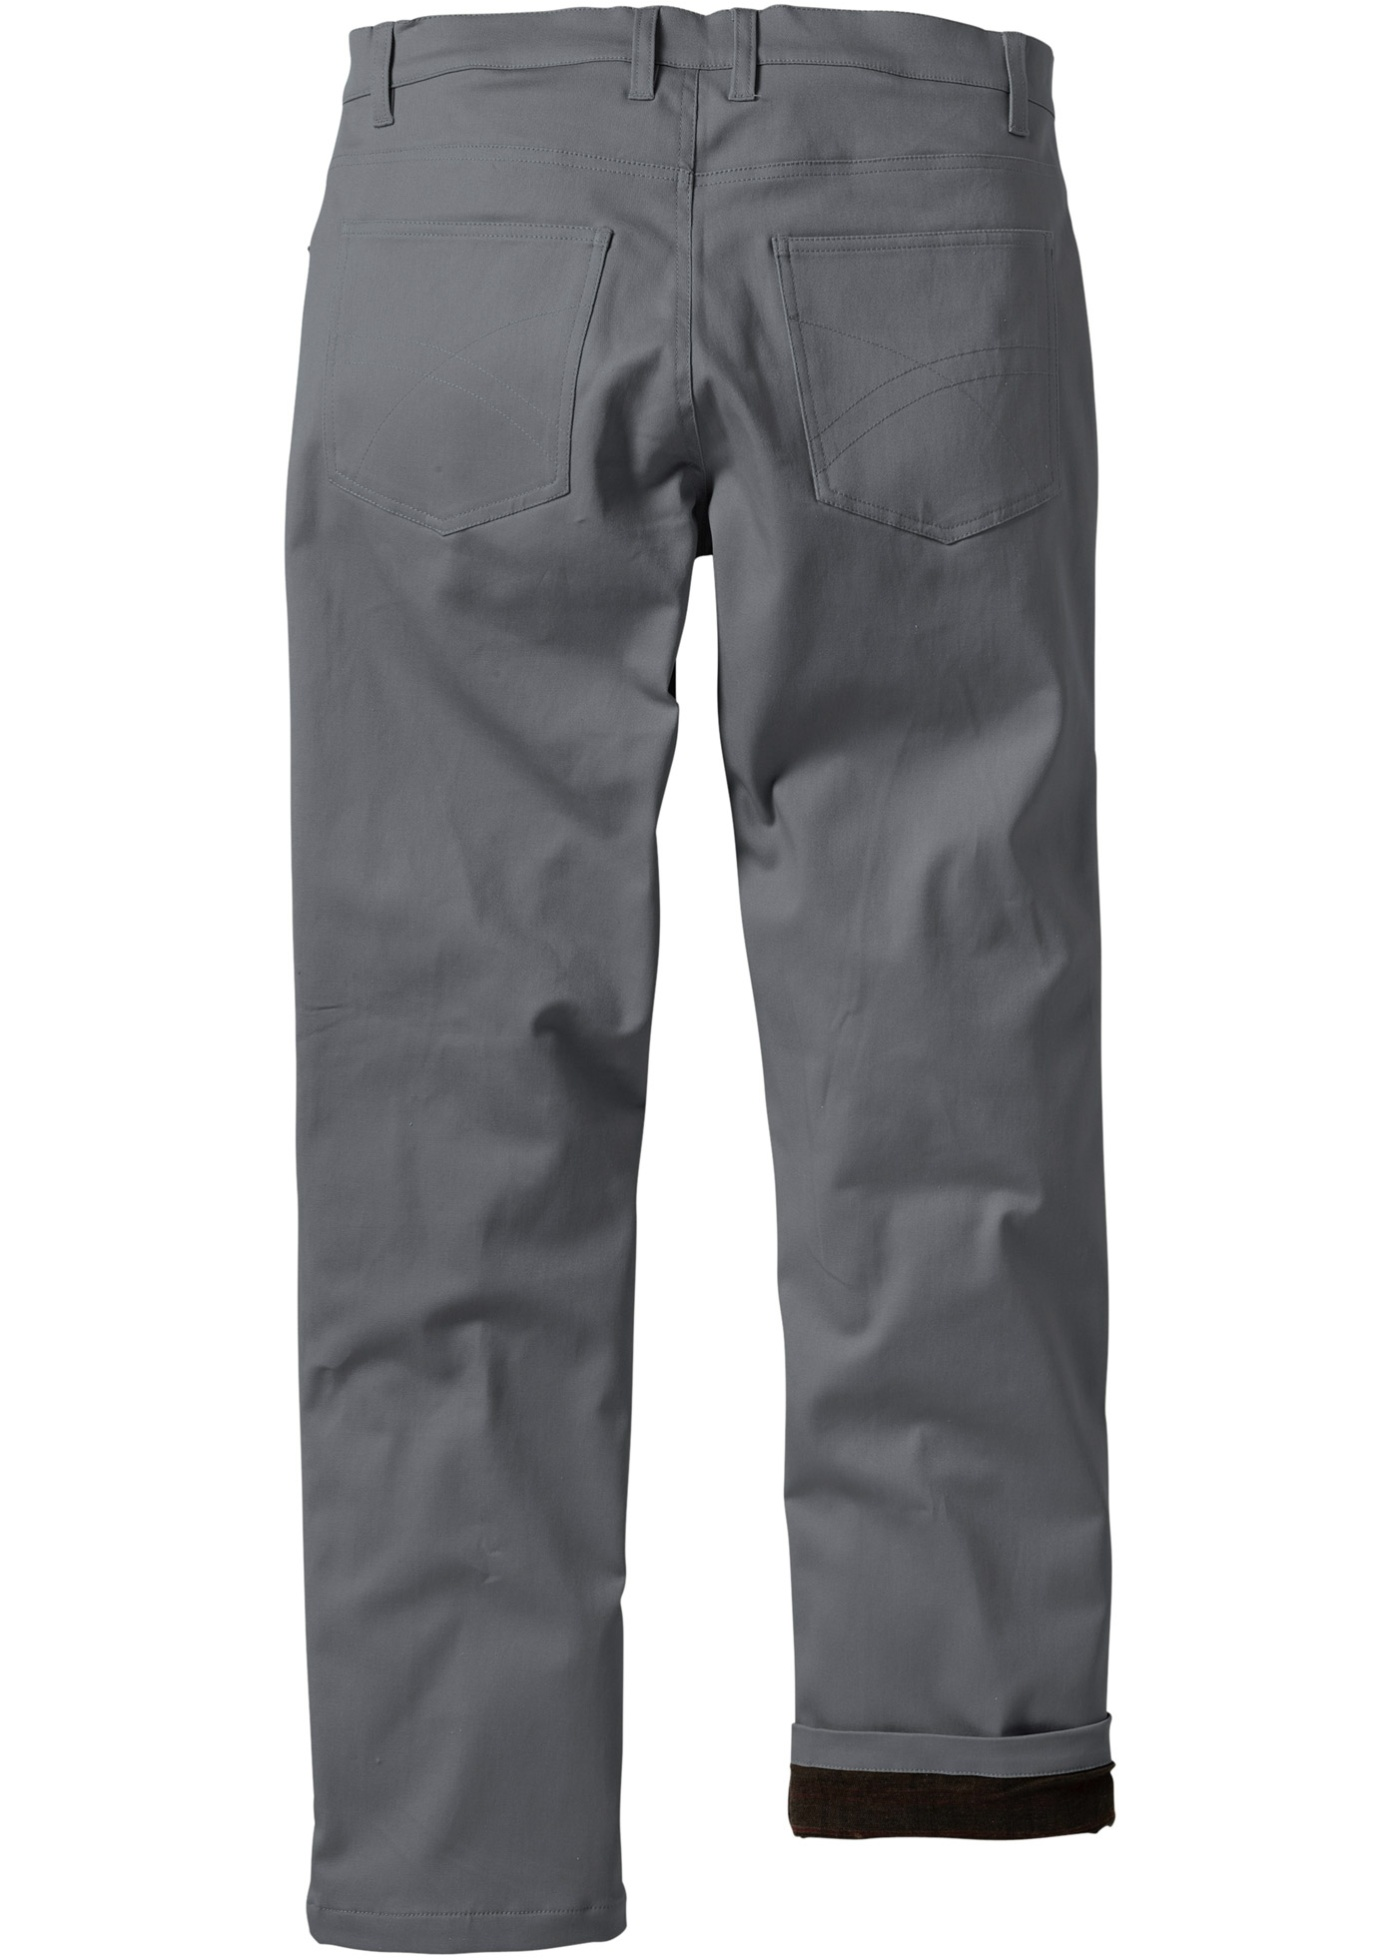 Pantalone termico elastic